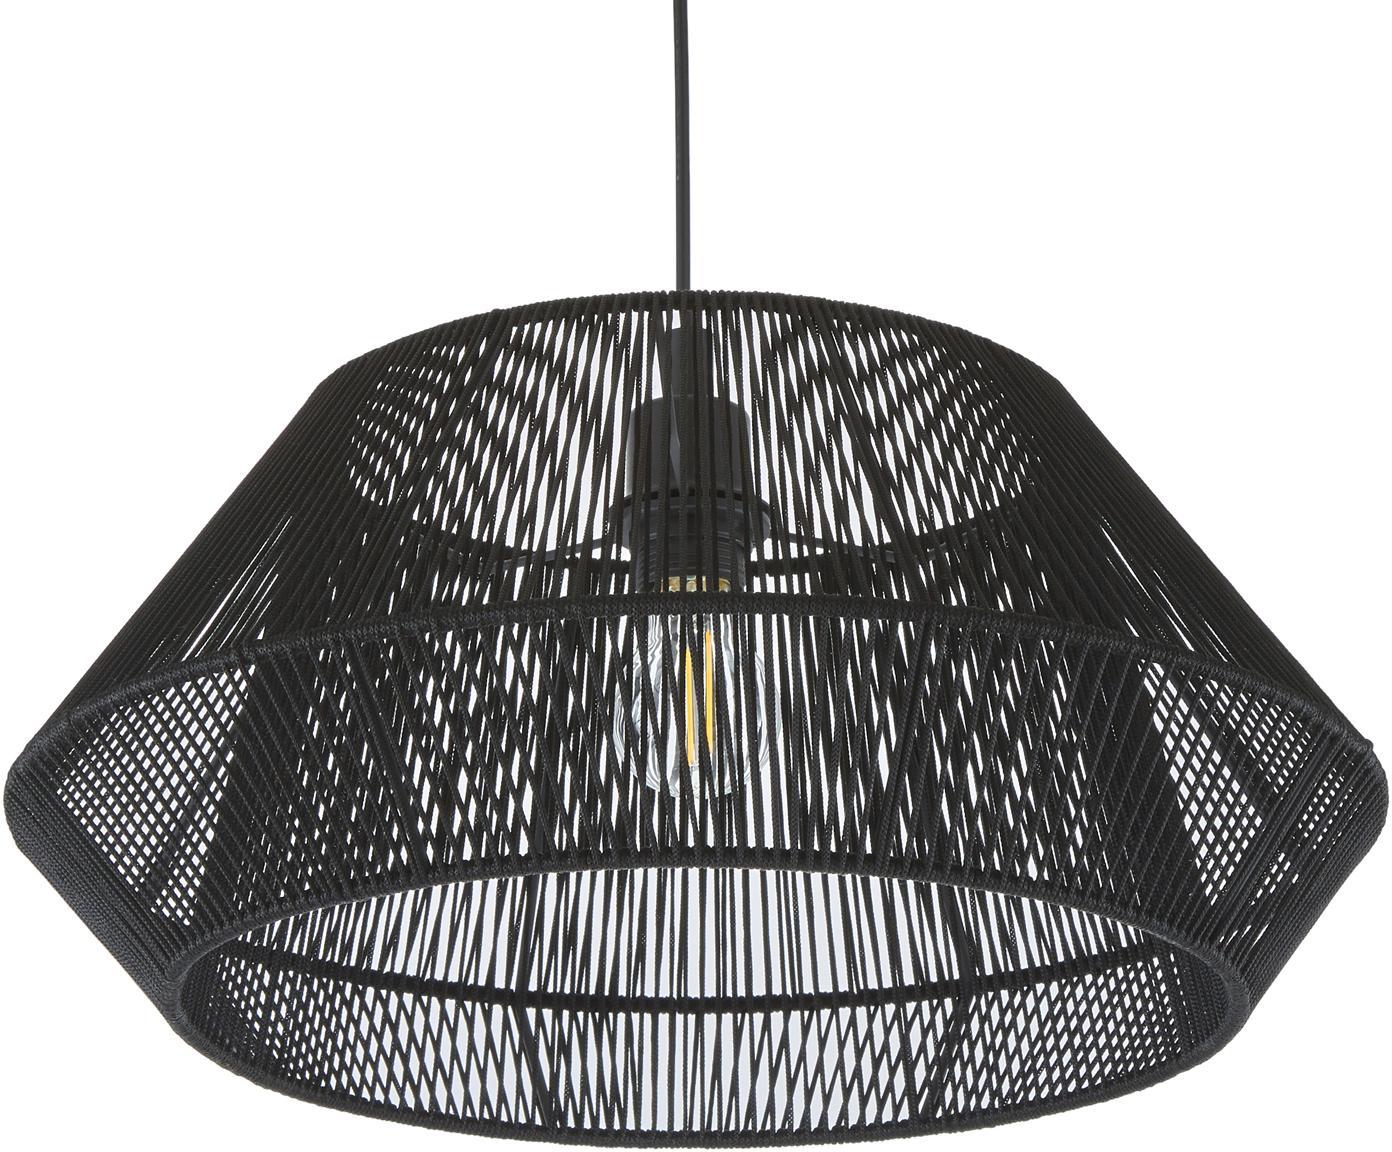 Pendelleuchte Hadi, Baldachin: Metall, pulverbeschichtet, Lampenschirm: Metall, pulverbeschichtet, Schwarz, Ø 48 x H 22 cm